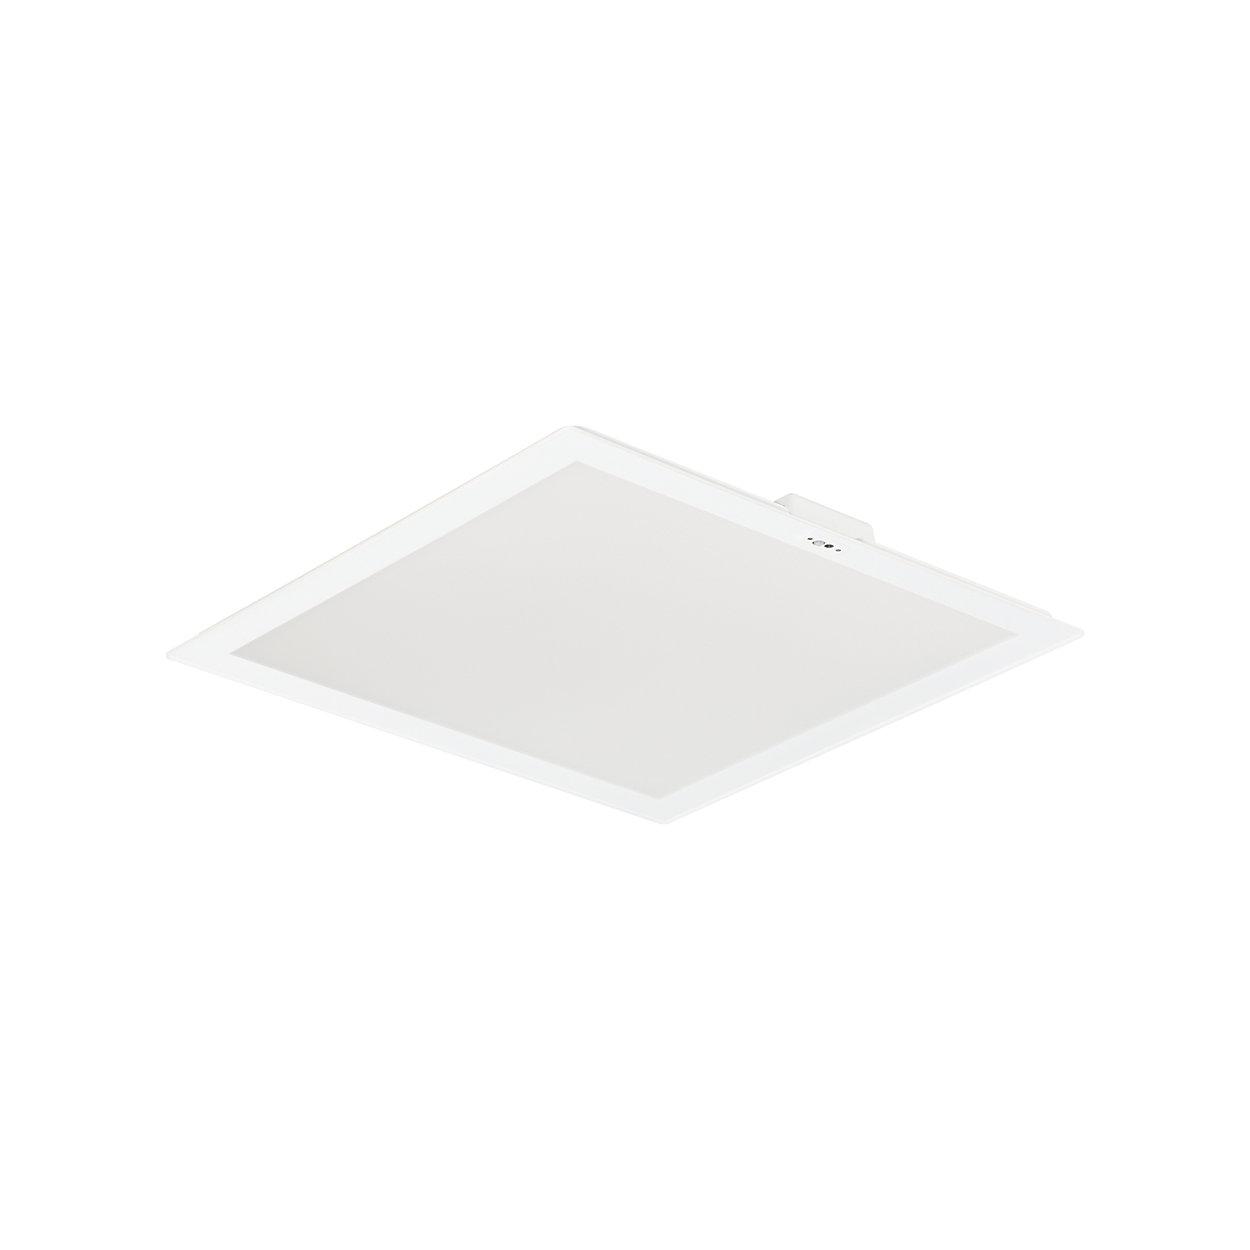 SlimBlend Square - High performance, advanced control